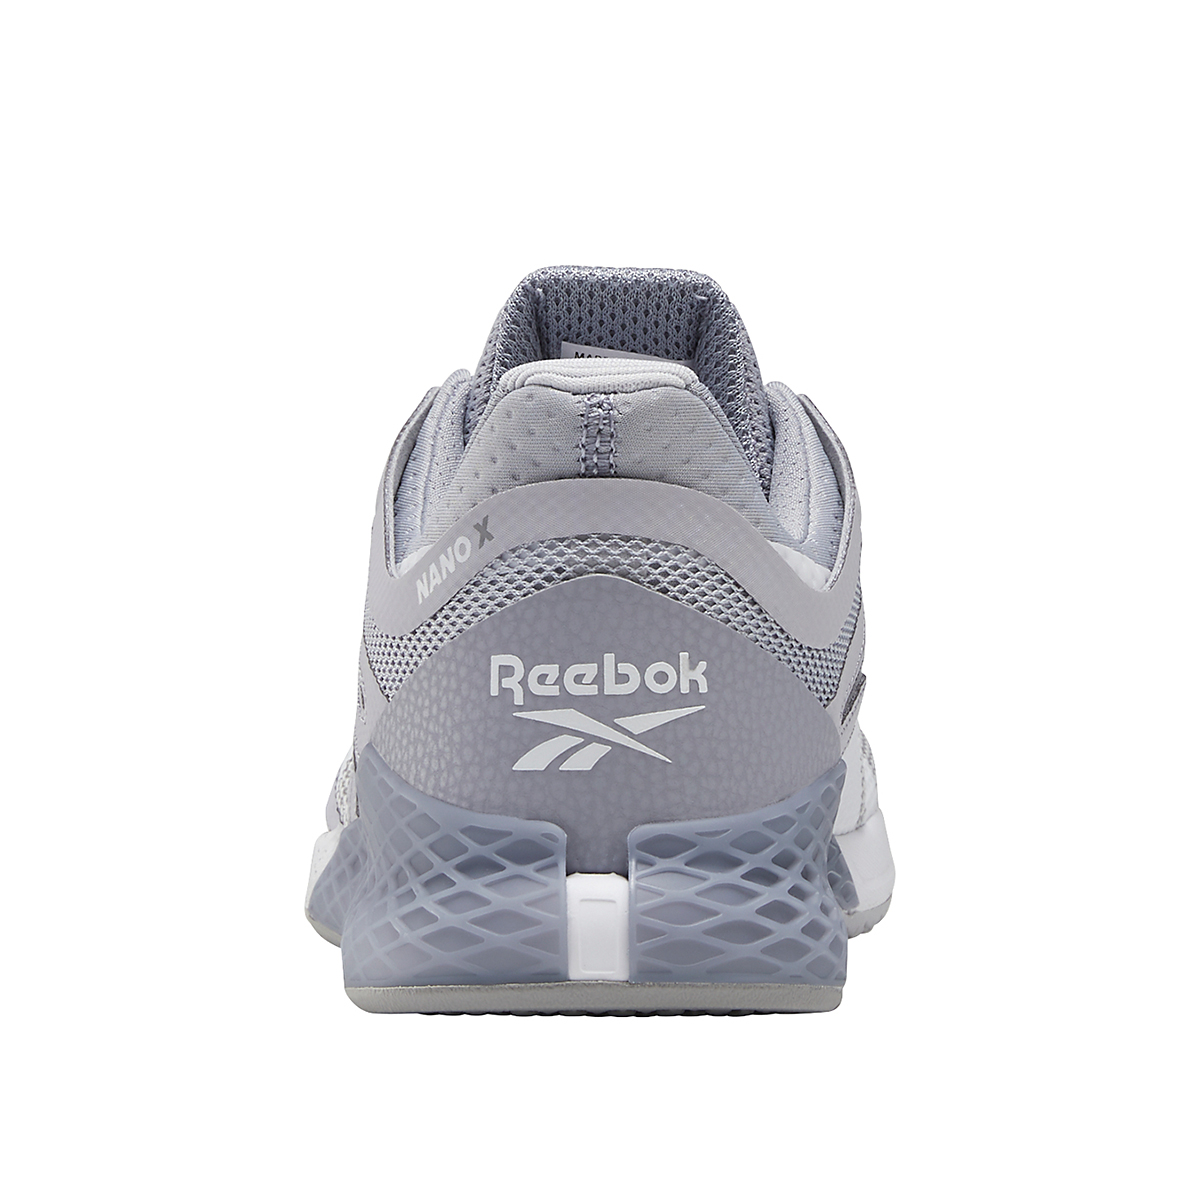 Women's Reebok Nano X Training Shoe - Color: Cold Grey/Cool Shadow/White - Size: 5 - Width: Regular, Cold Grey/Cool Shadow/White, large, image 6